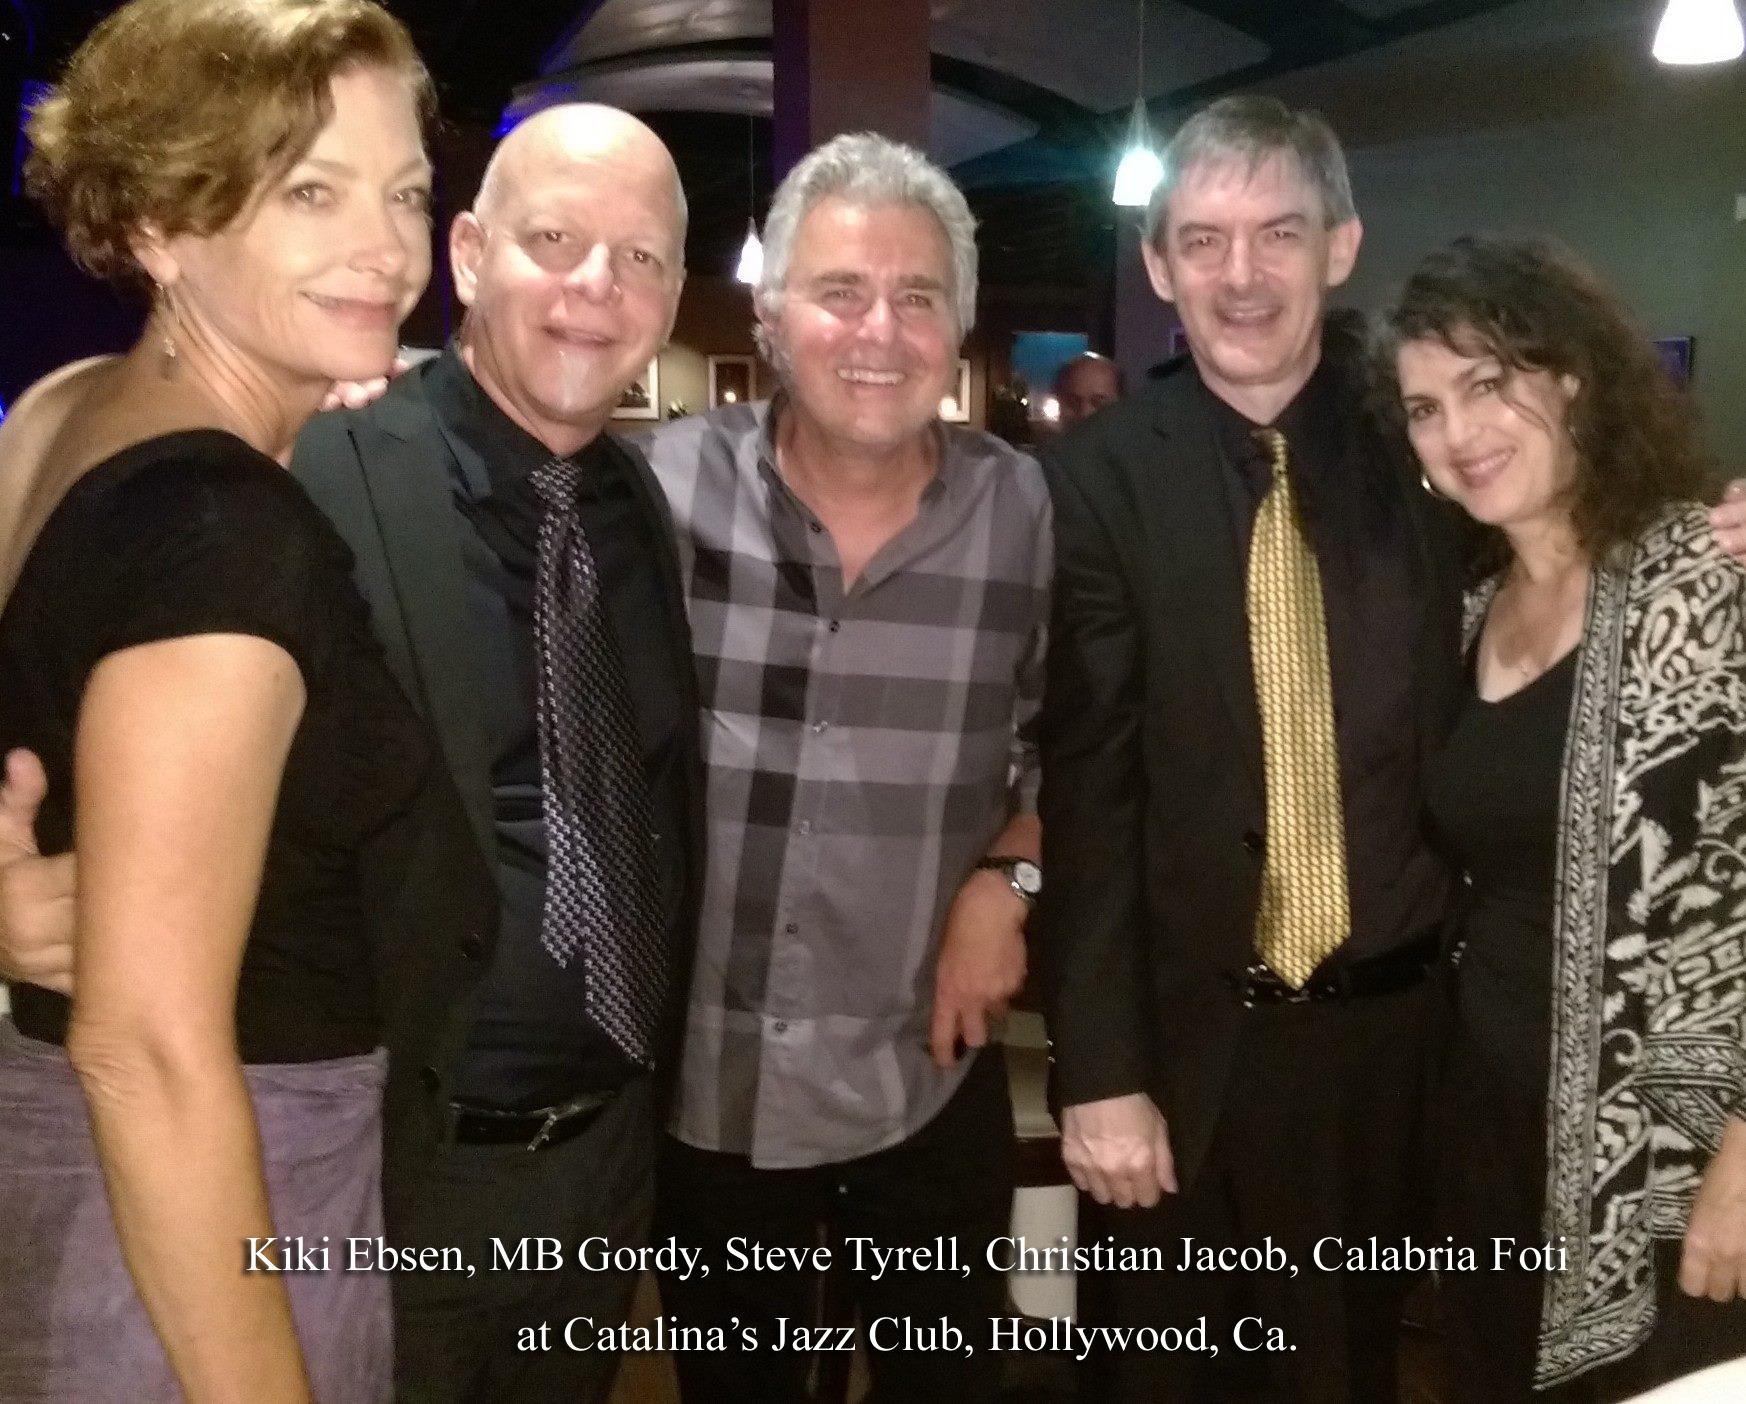 Calab and Friends at Catalinas